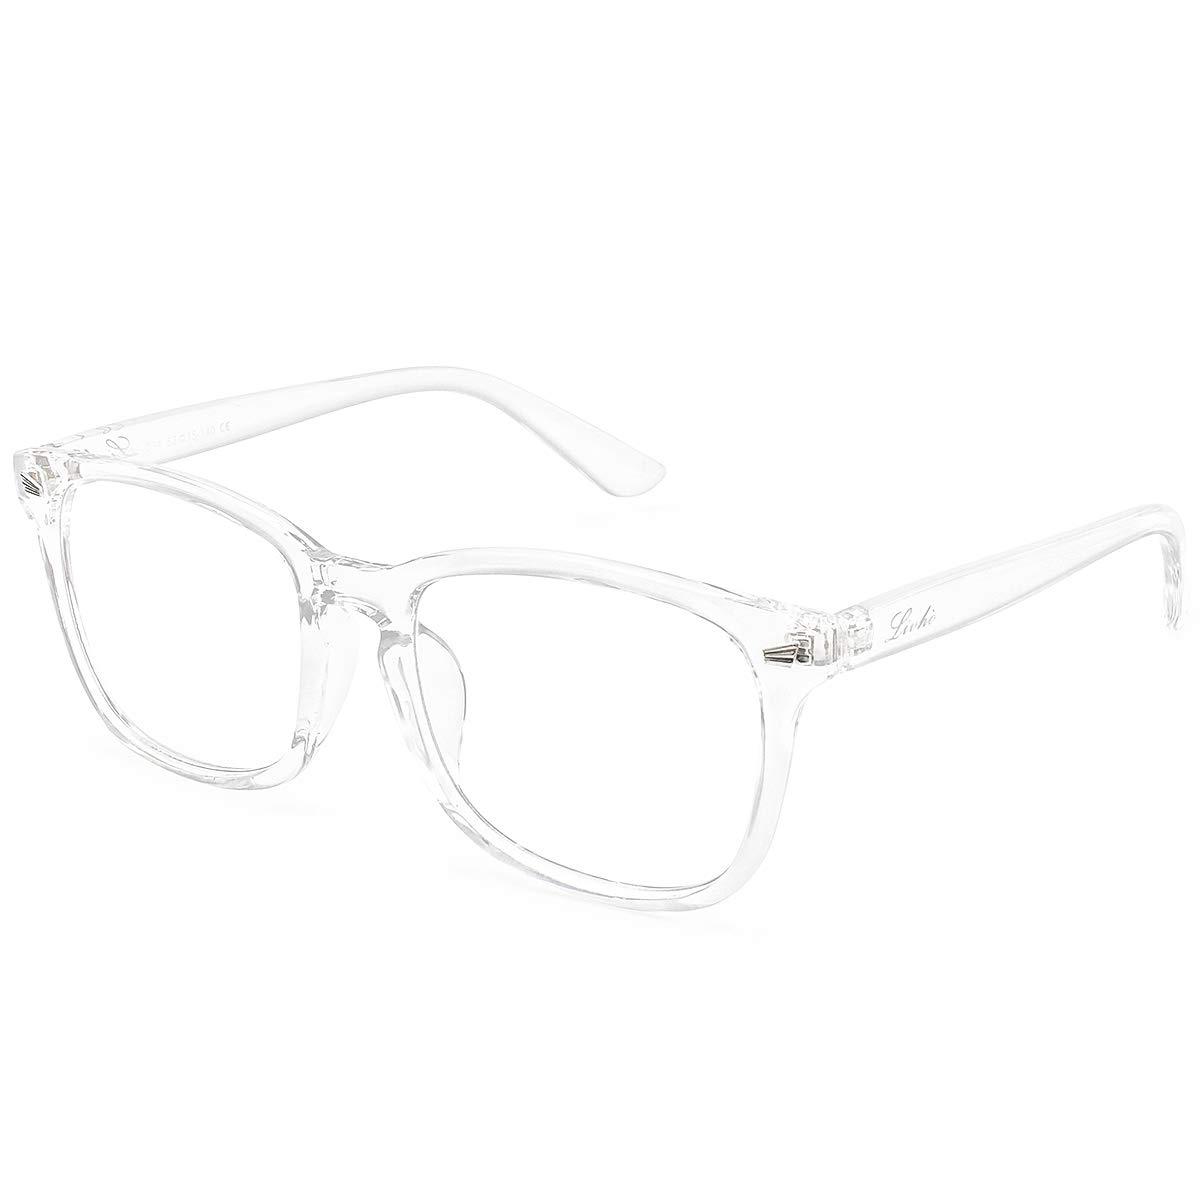 e1d7a1f075d3 Livhò Blue Light Blocking Computer Glasses,Tablet/Gaming/TV/Phones Glasses  for